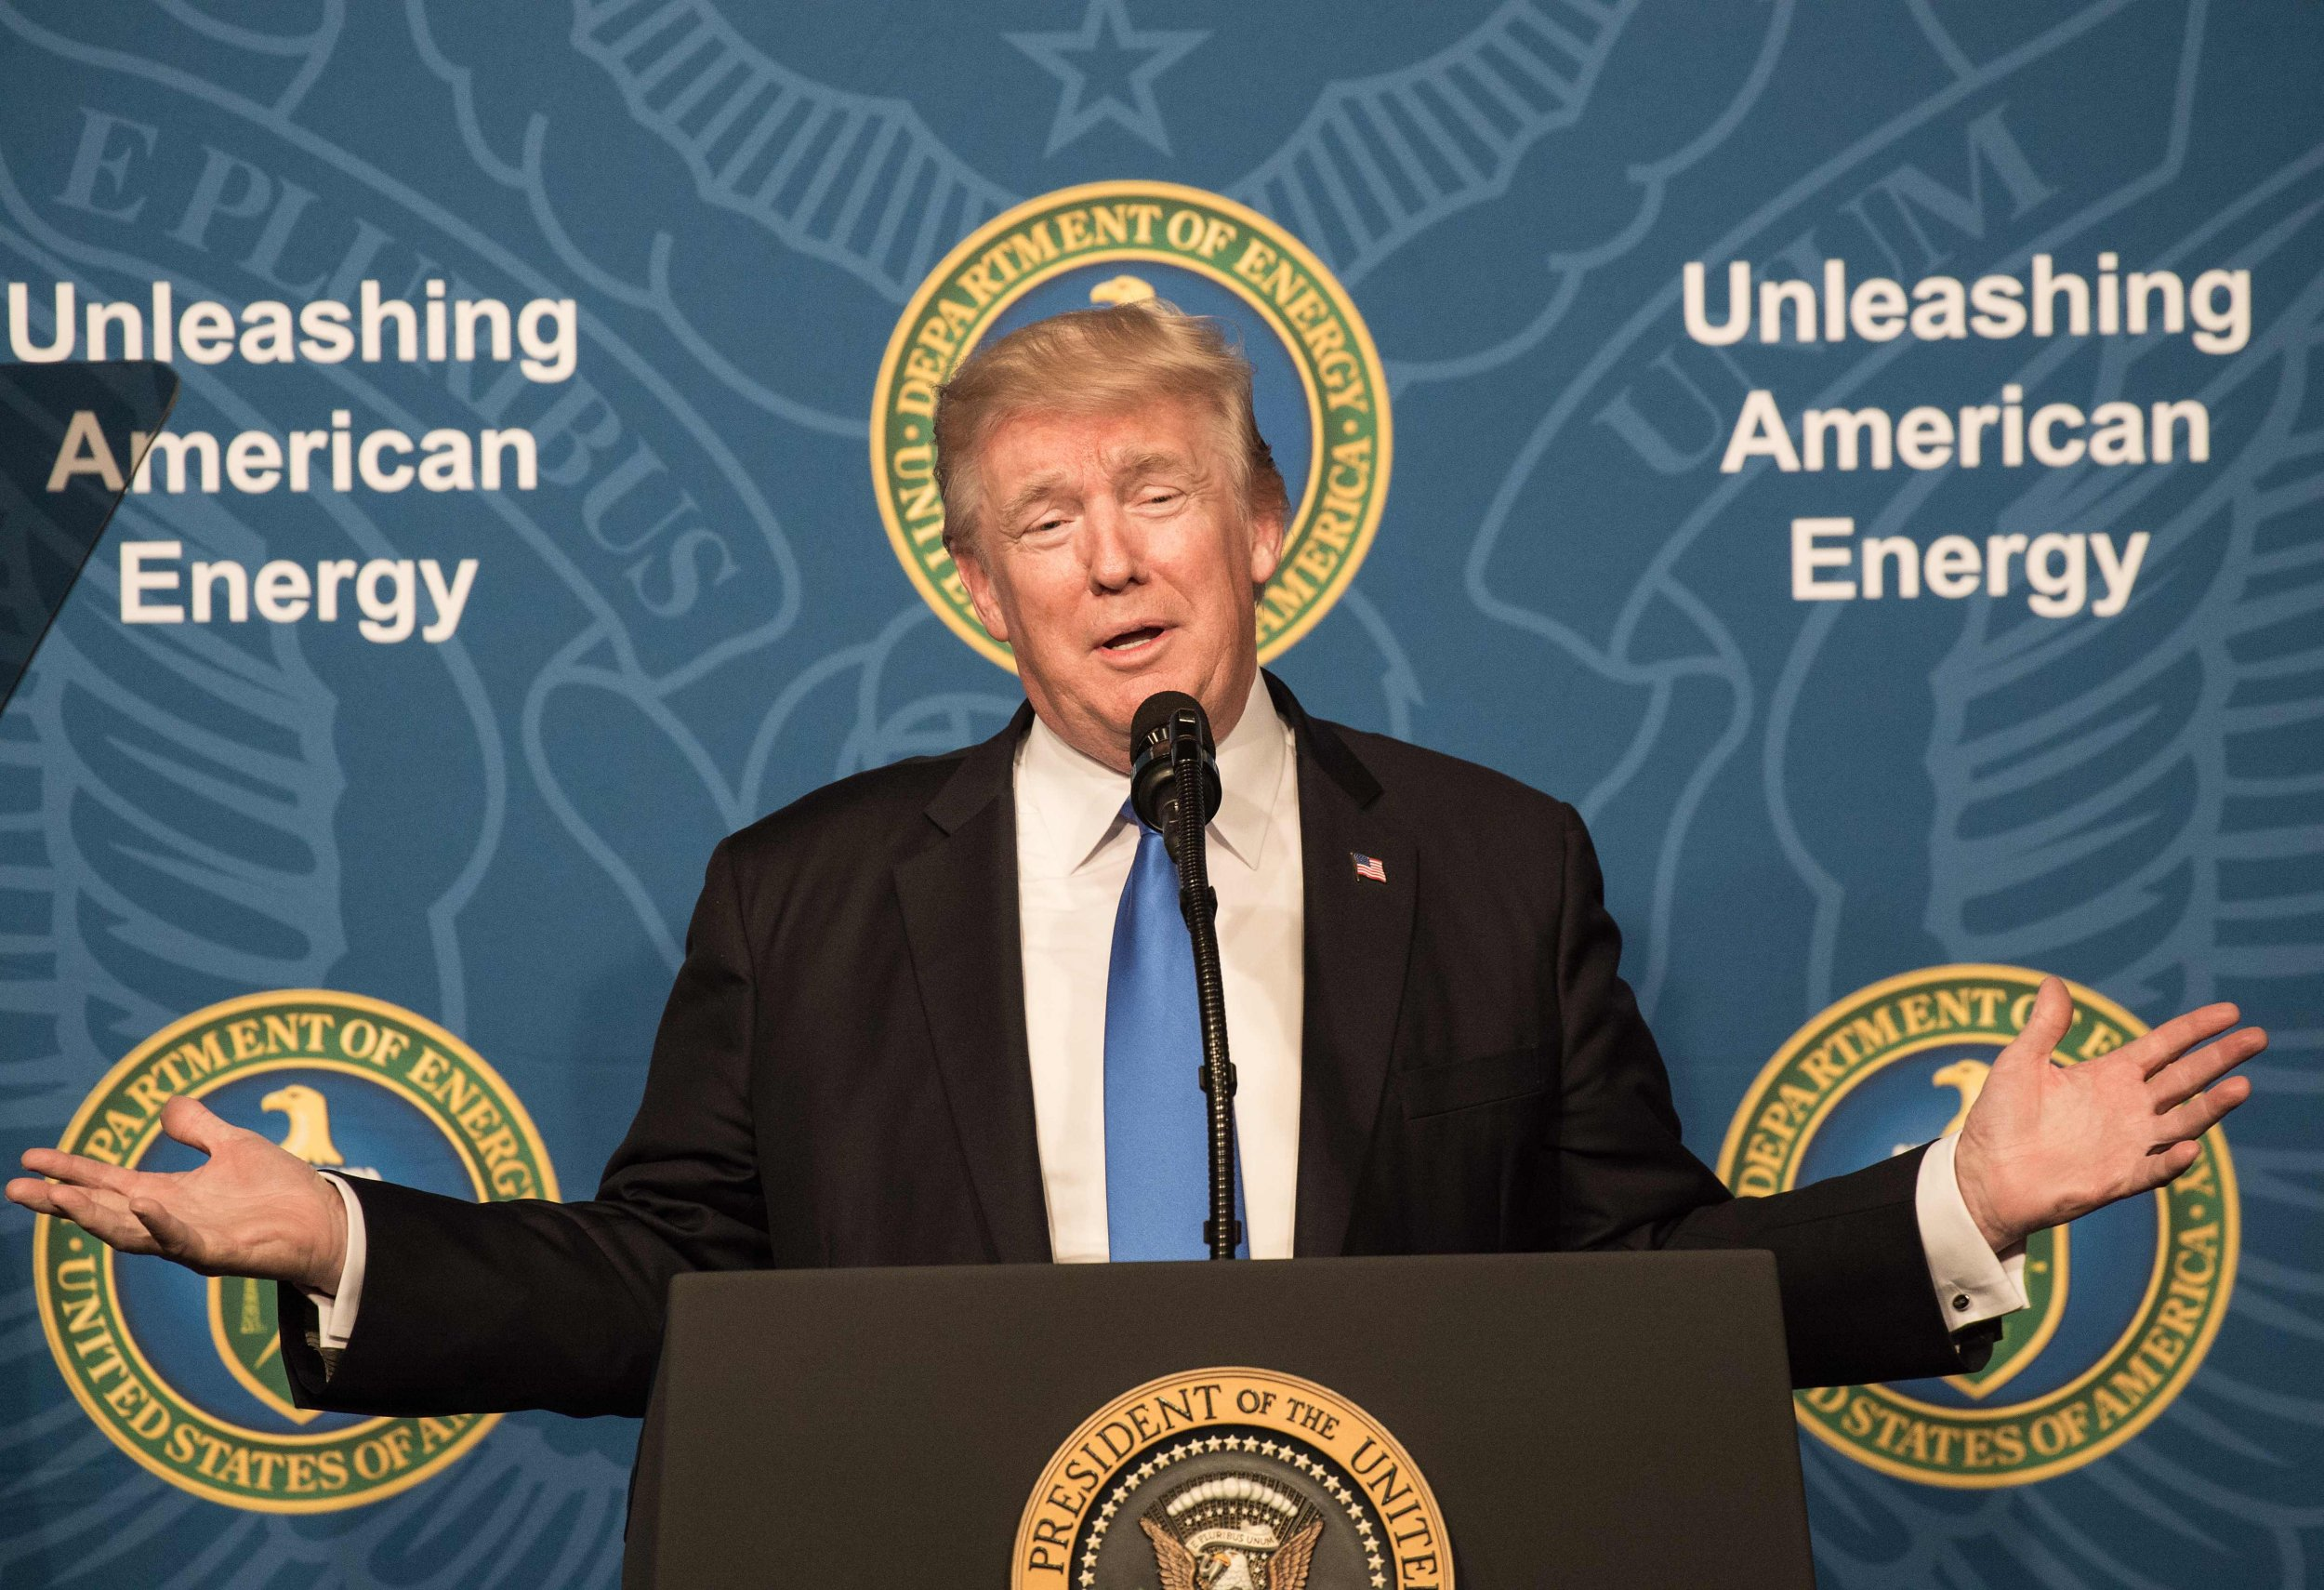 Donald Trump Talks Energy Policy